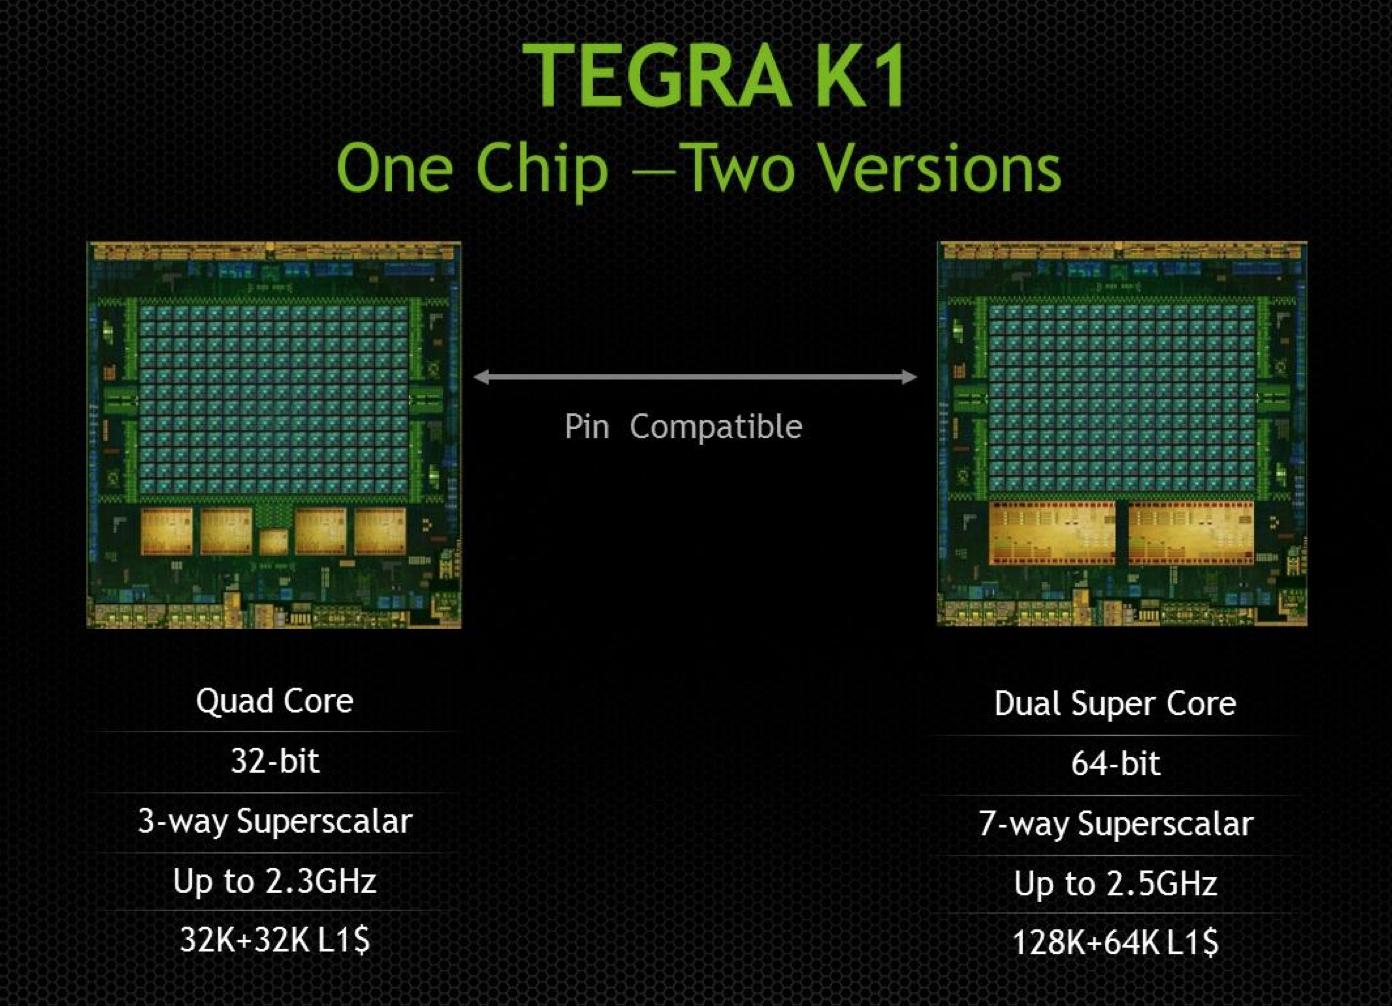 CPU Option 2: Dual-Core 64-bit NVIDIA Denver - NVIDIA Tegra